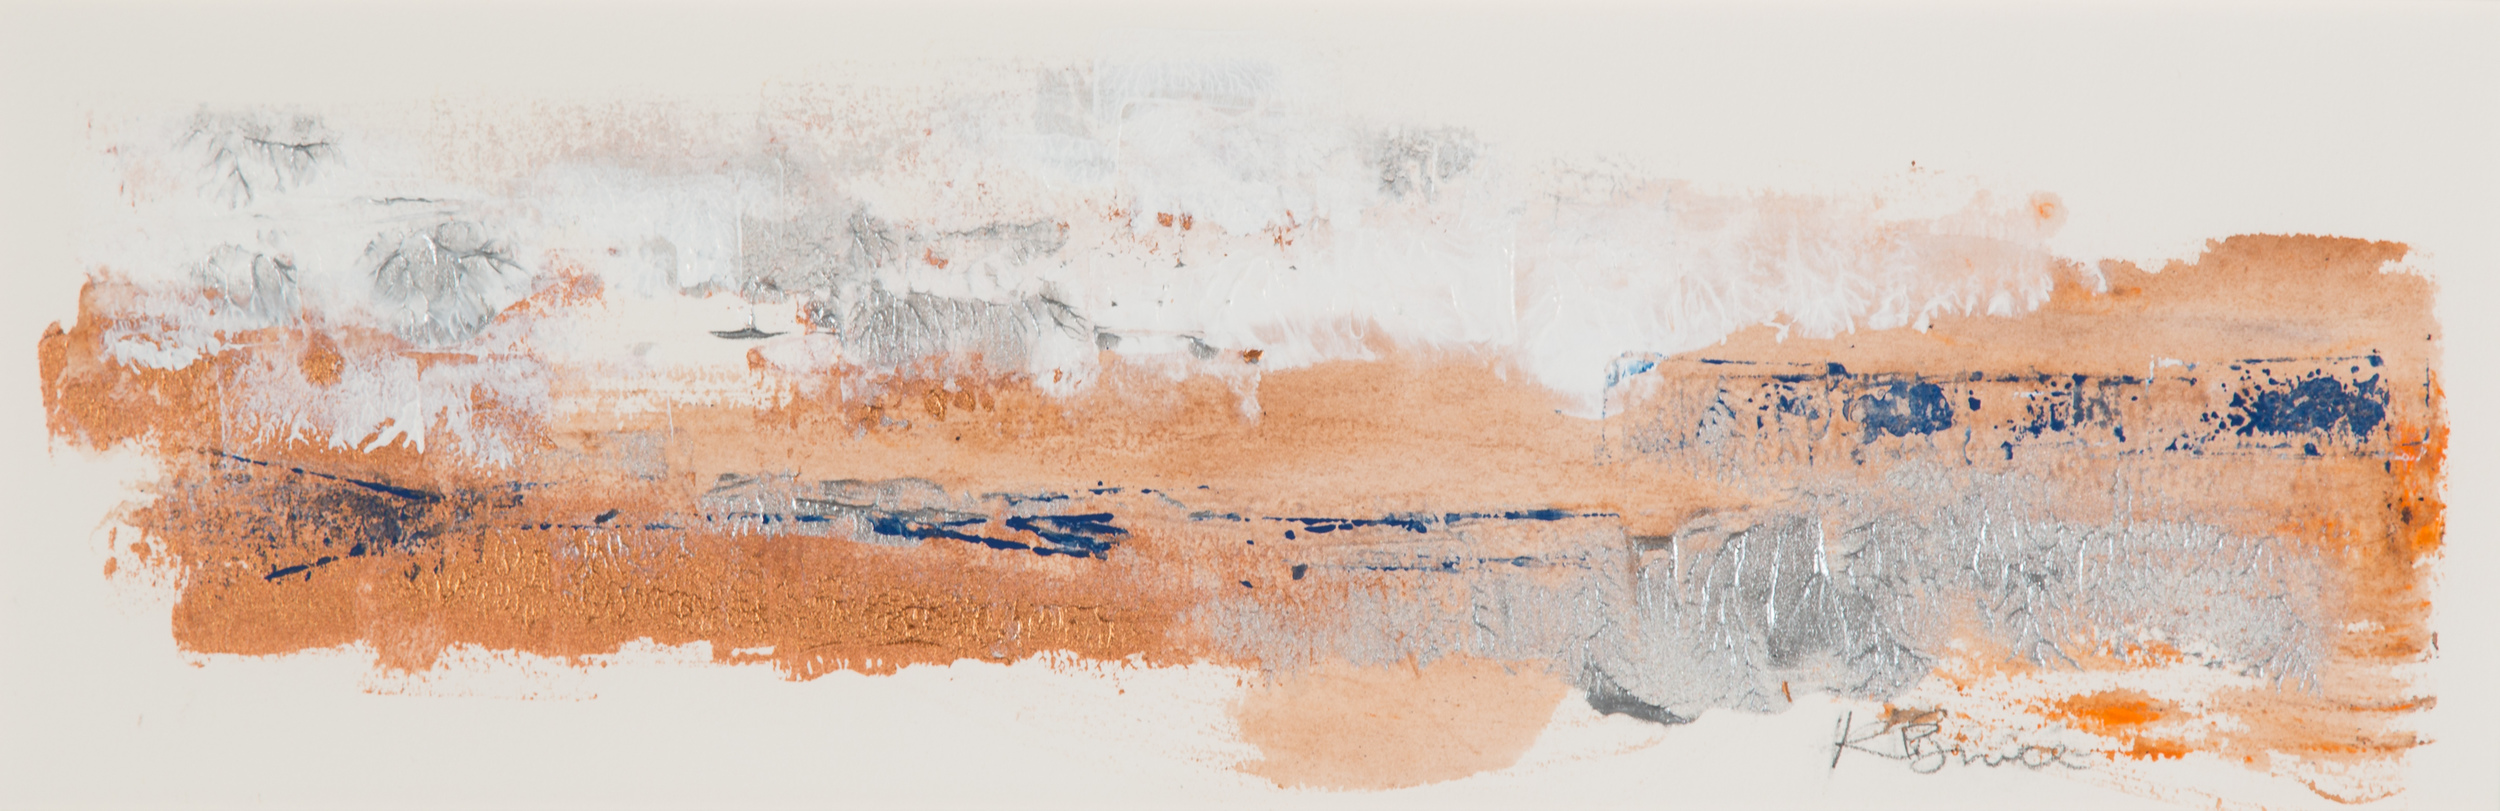 KB-074, Katharine Bruce, Changing Seasons 1, 2015, Acrylic on Paper, 22x7, $1,200